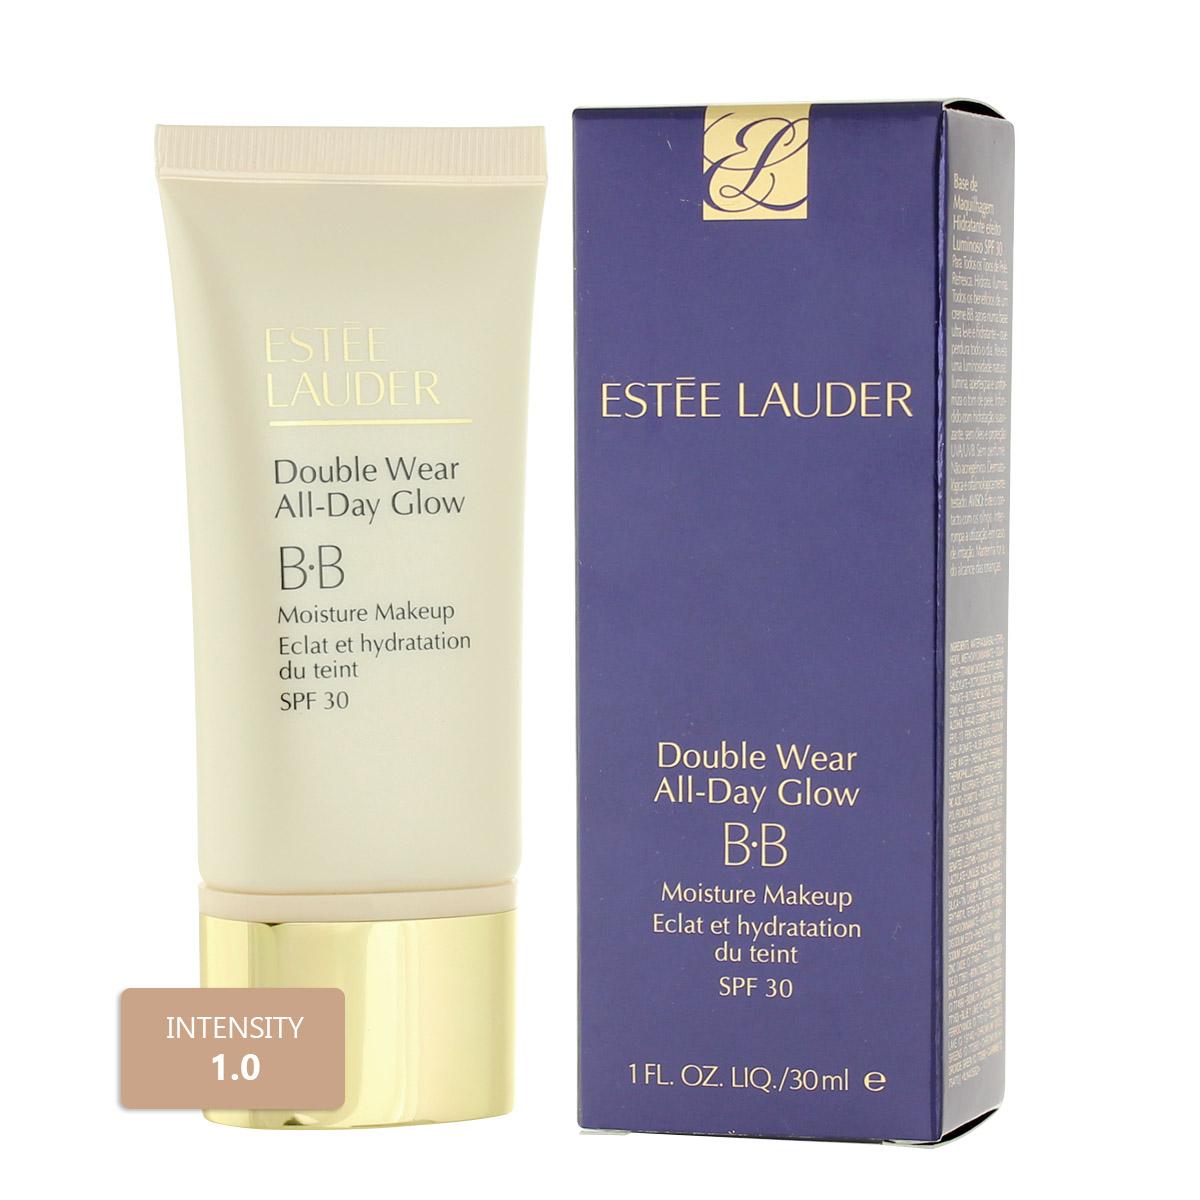 Estée Lauder Double Wear All-Day Glow BB Makeup (INTENSITY 1.0) 30 ml